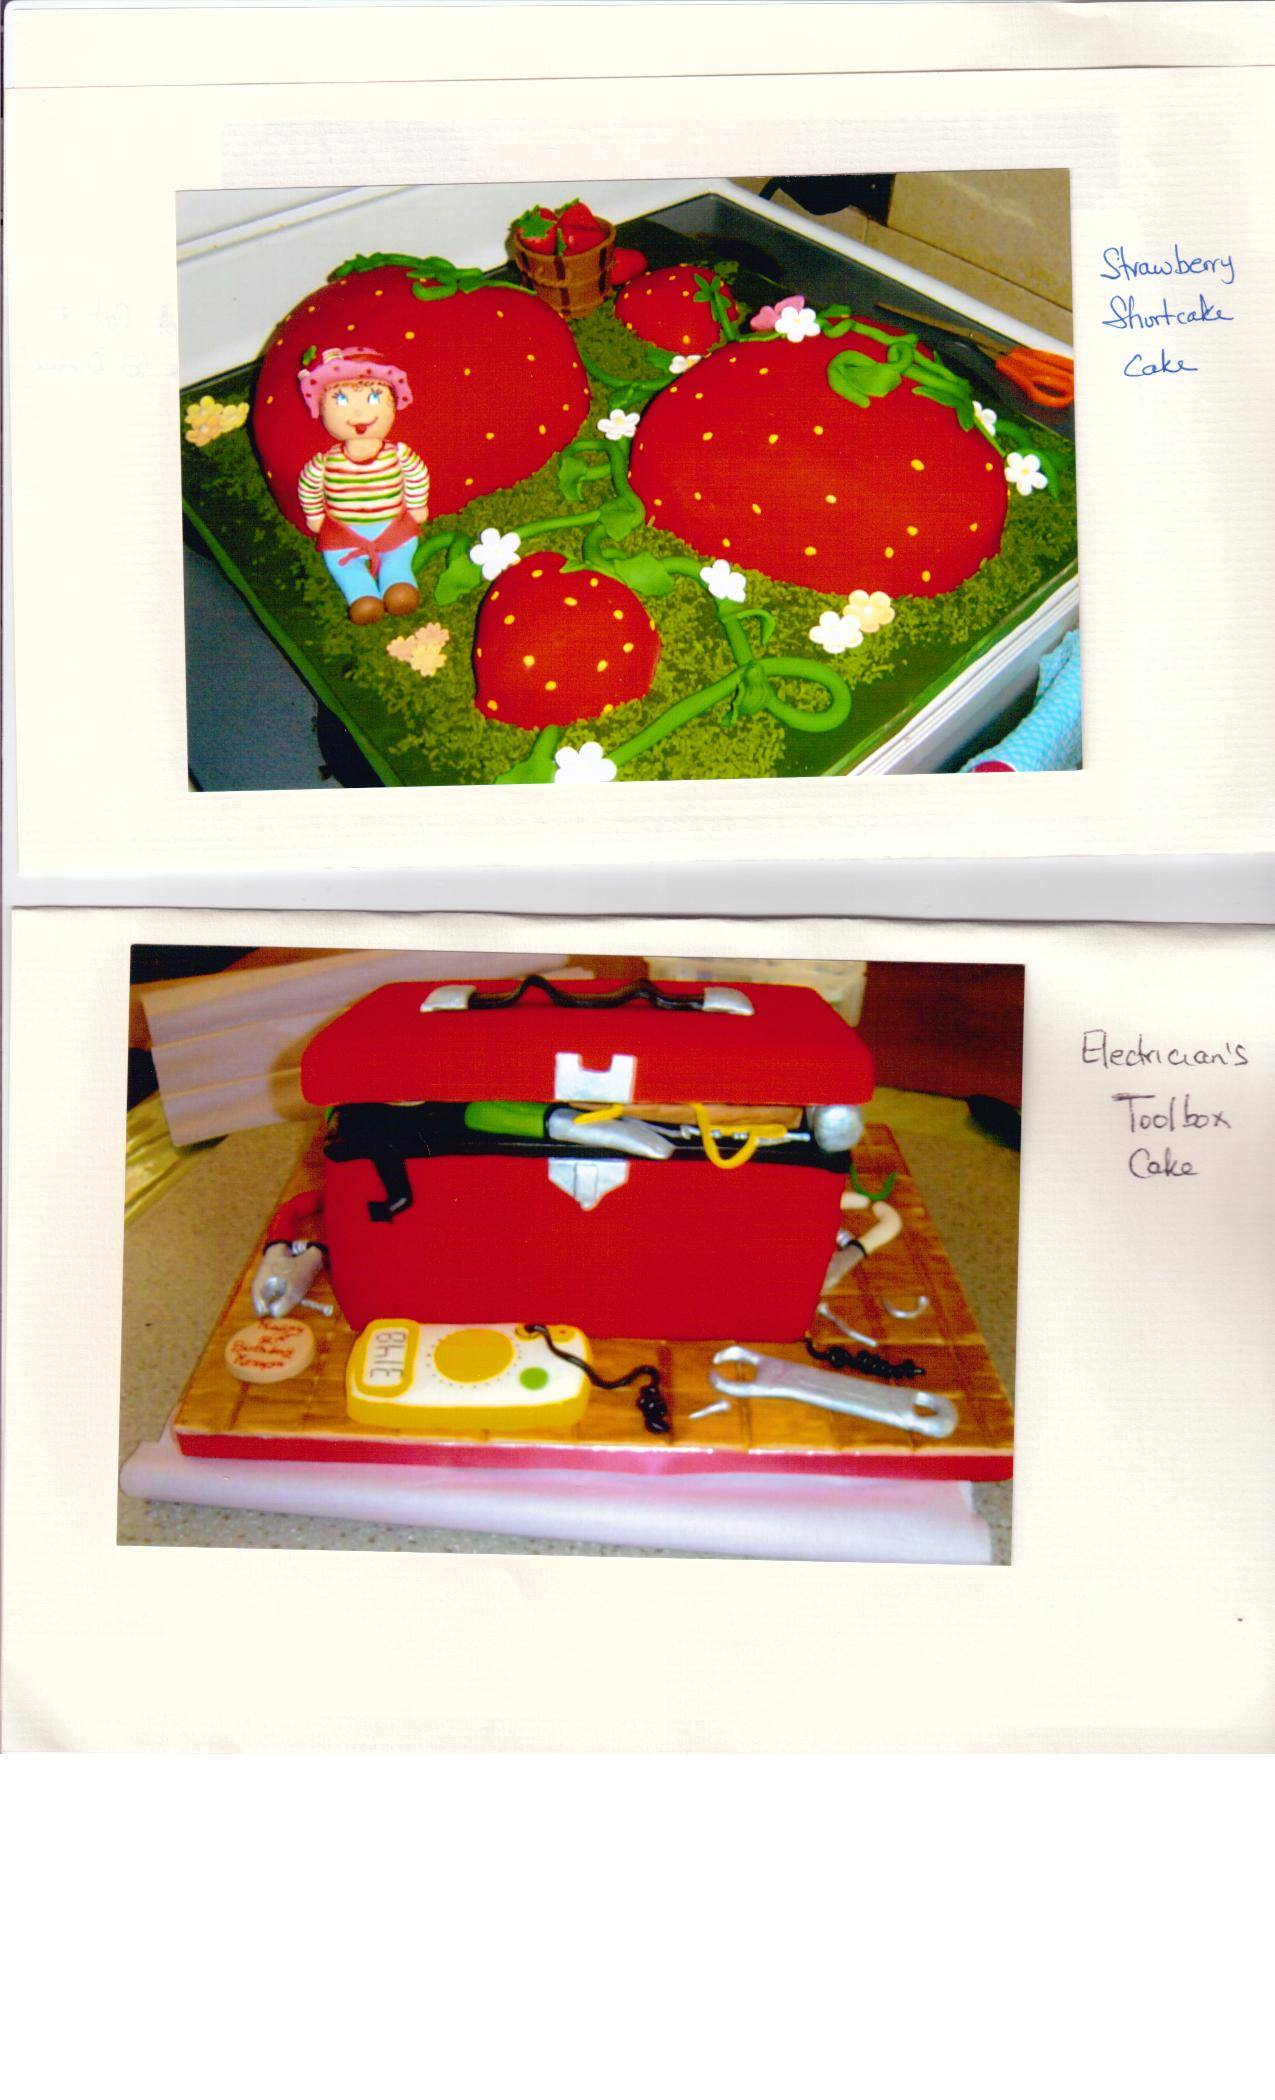 CAKE 01G -Tool Box Cake